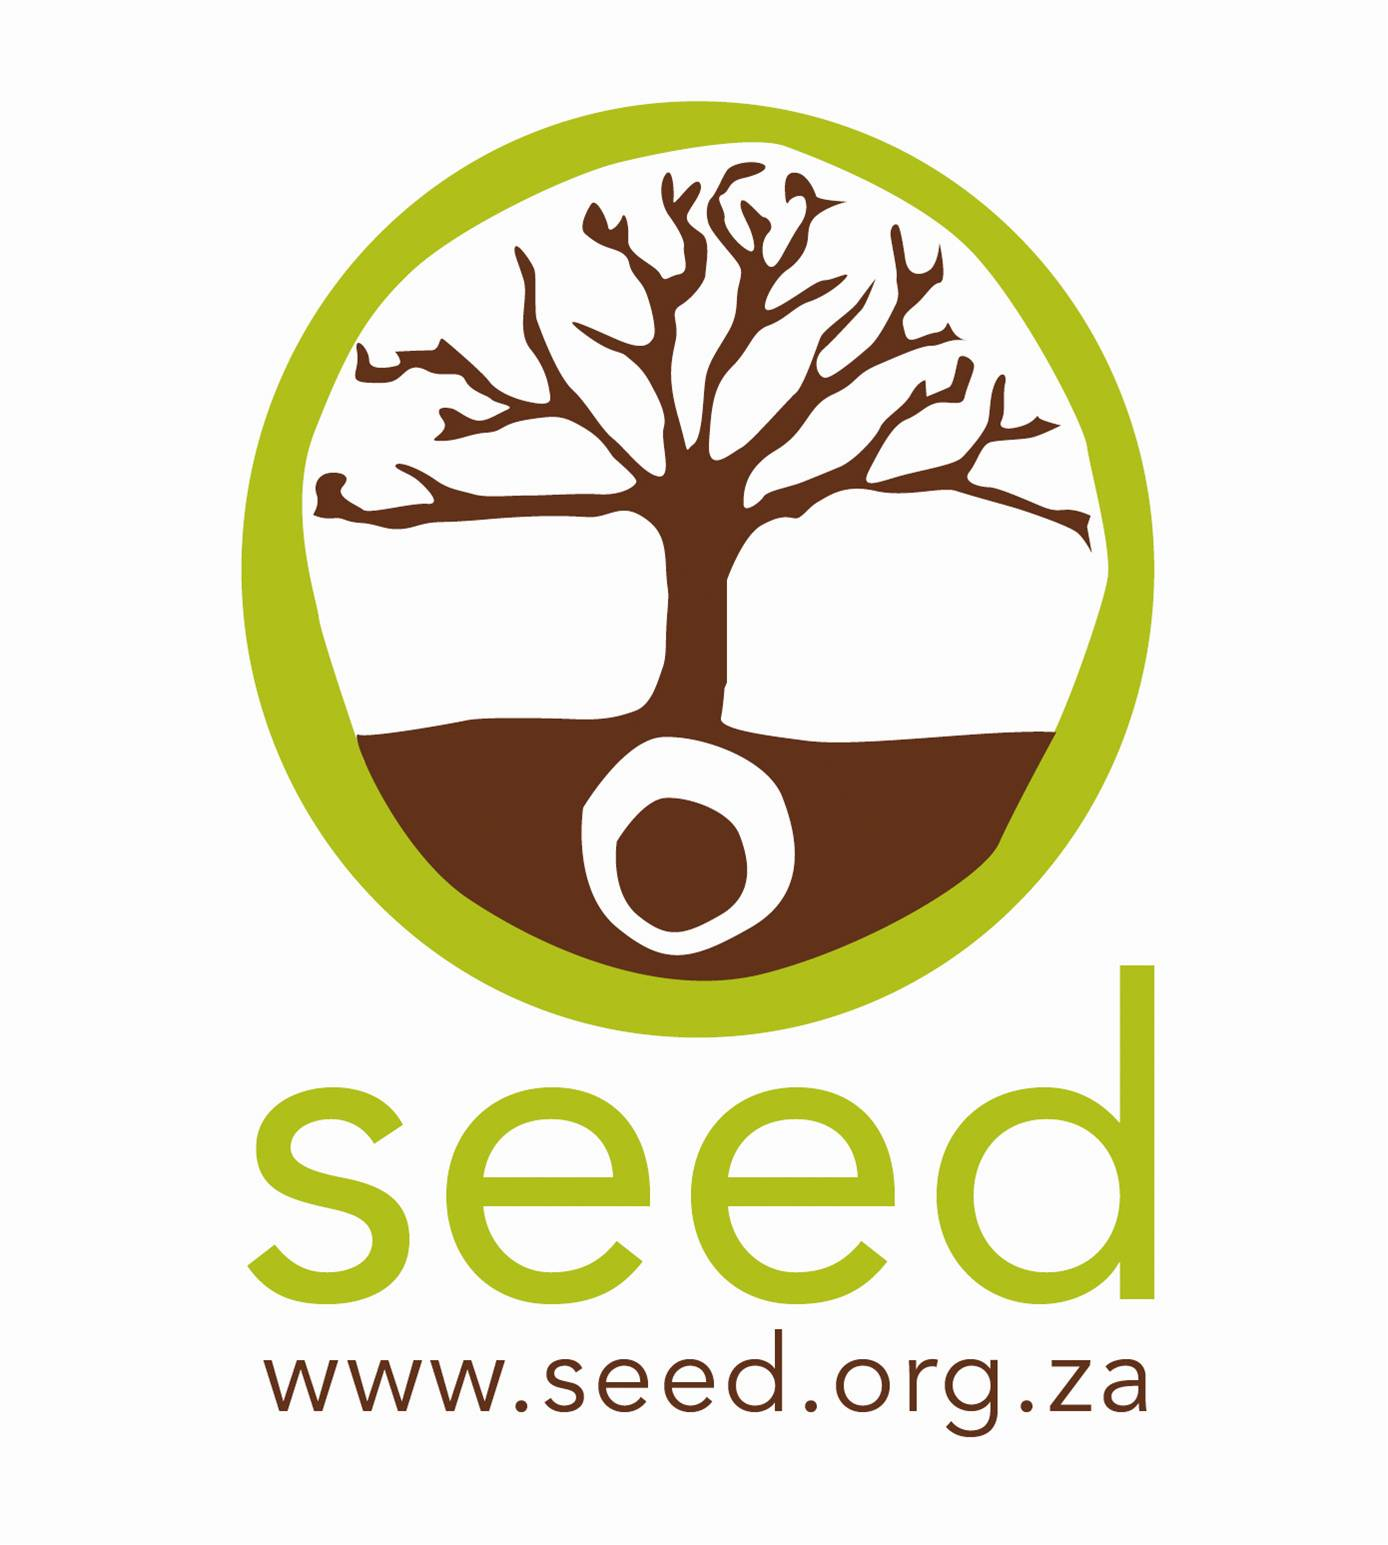 Western Seed Logo photo - 1